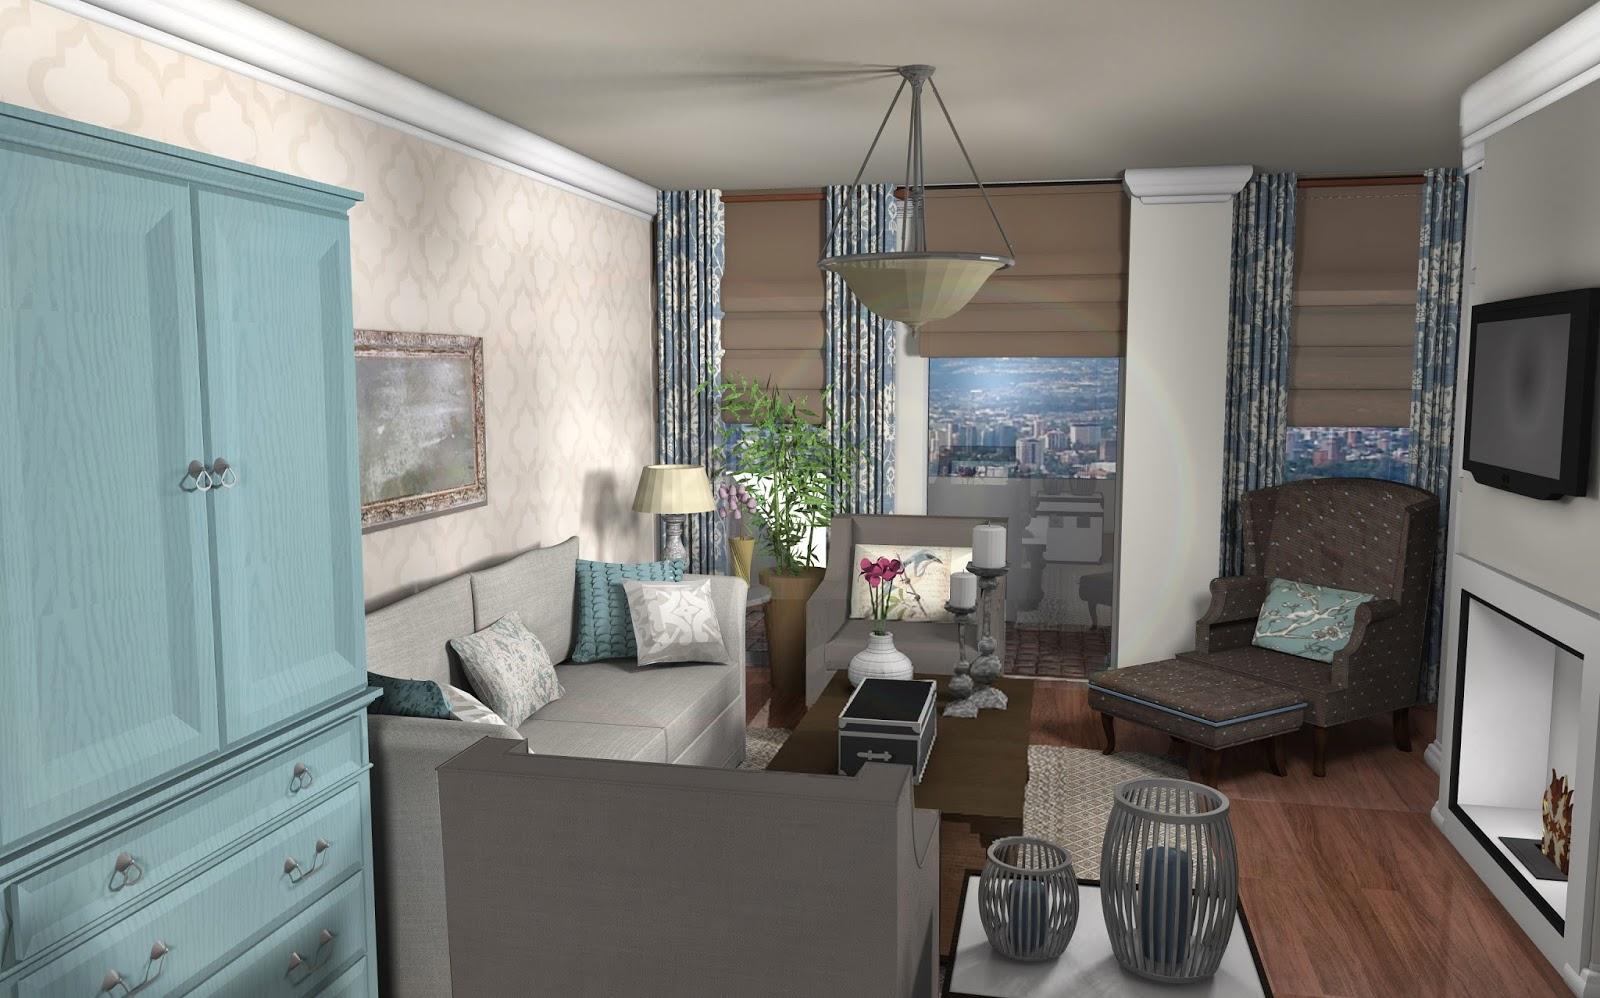 interior design guatemala, diseño de interiores guatemala, diseño de interiores, san lazaro